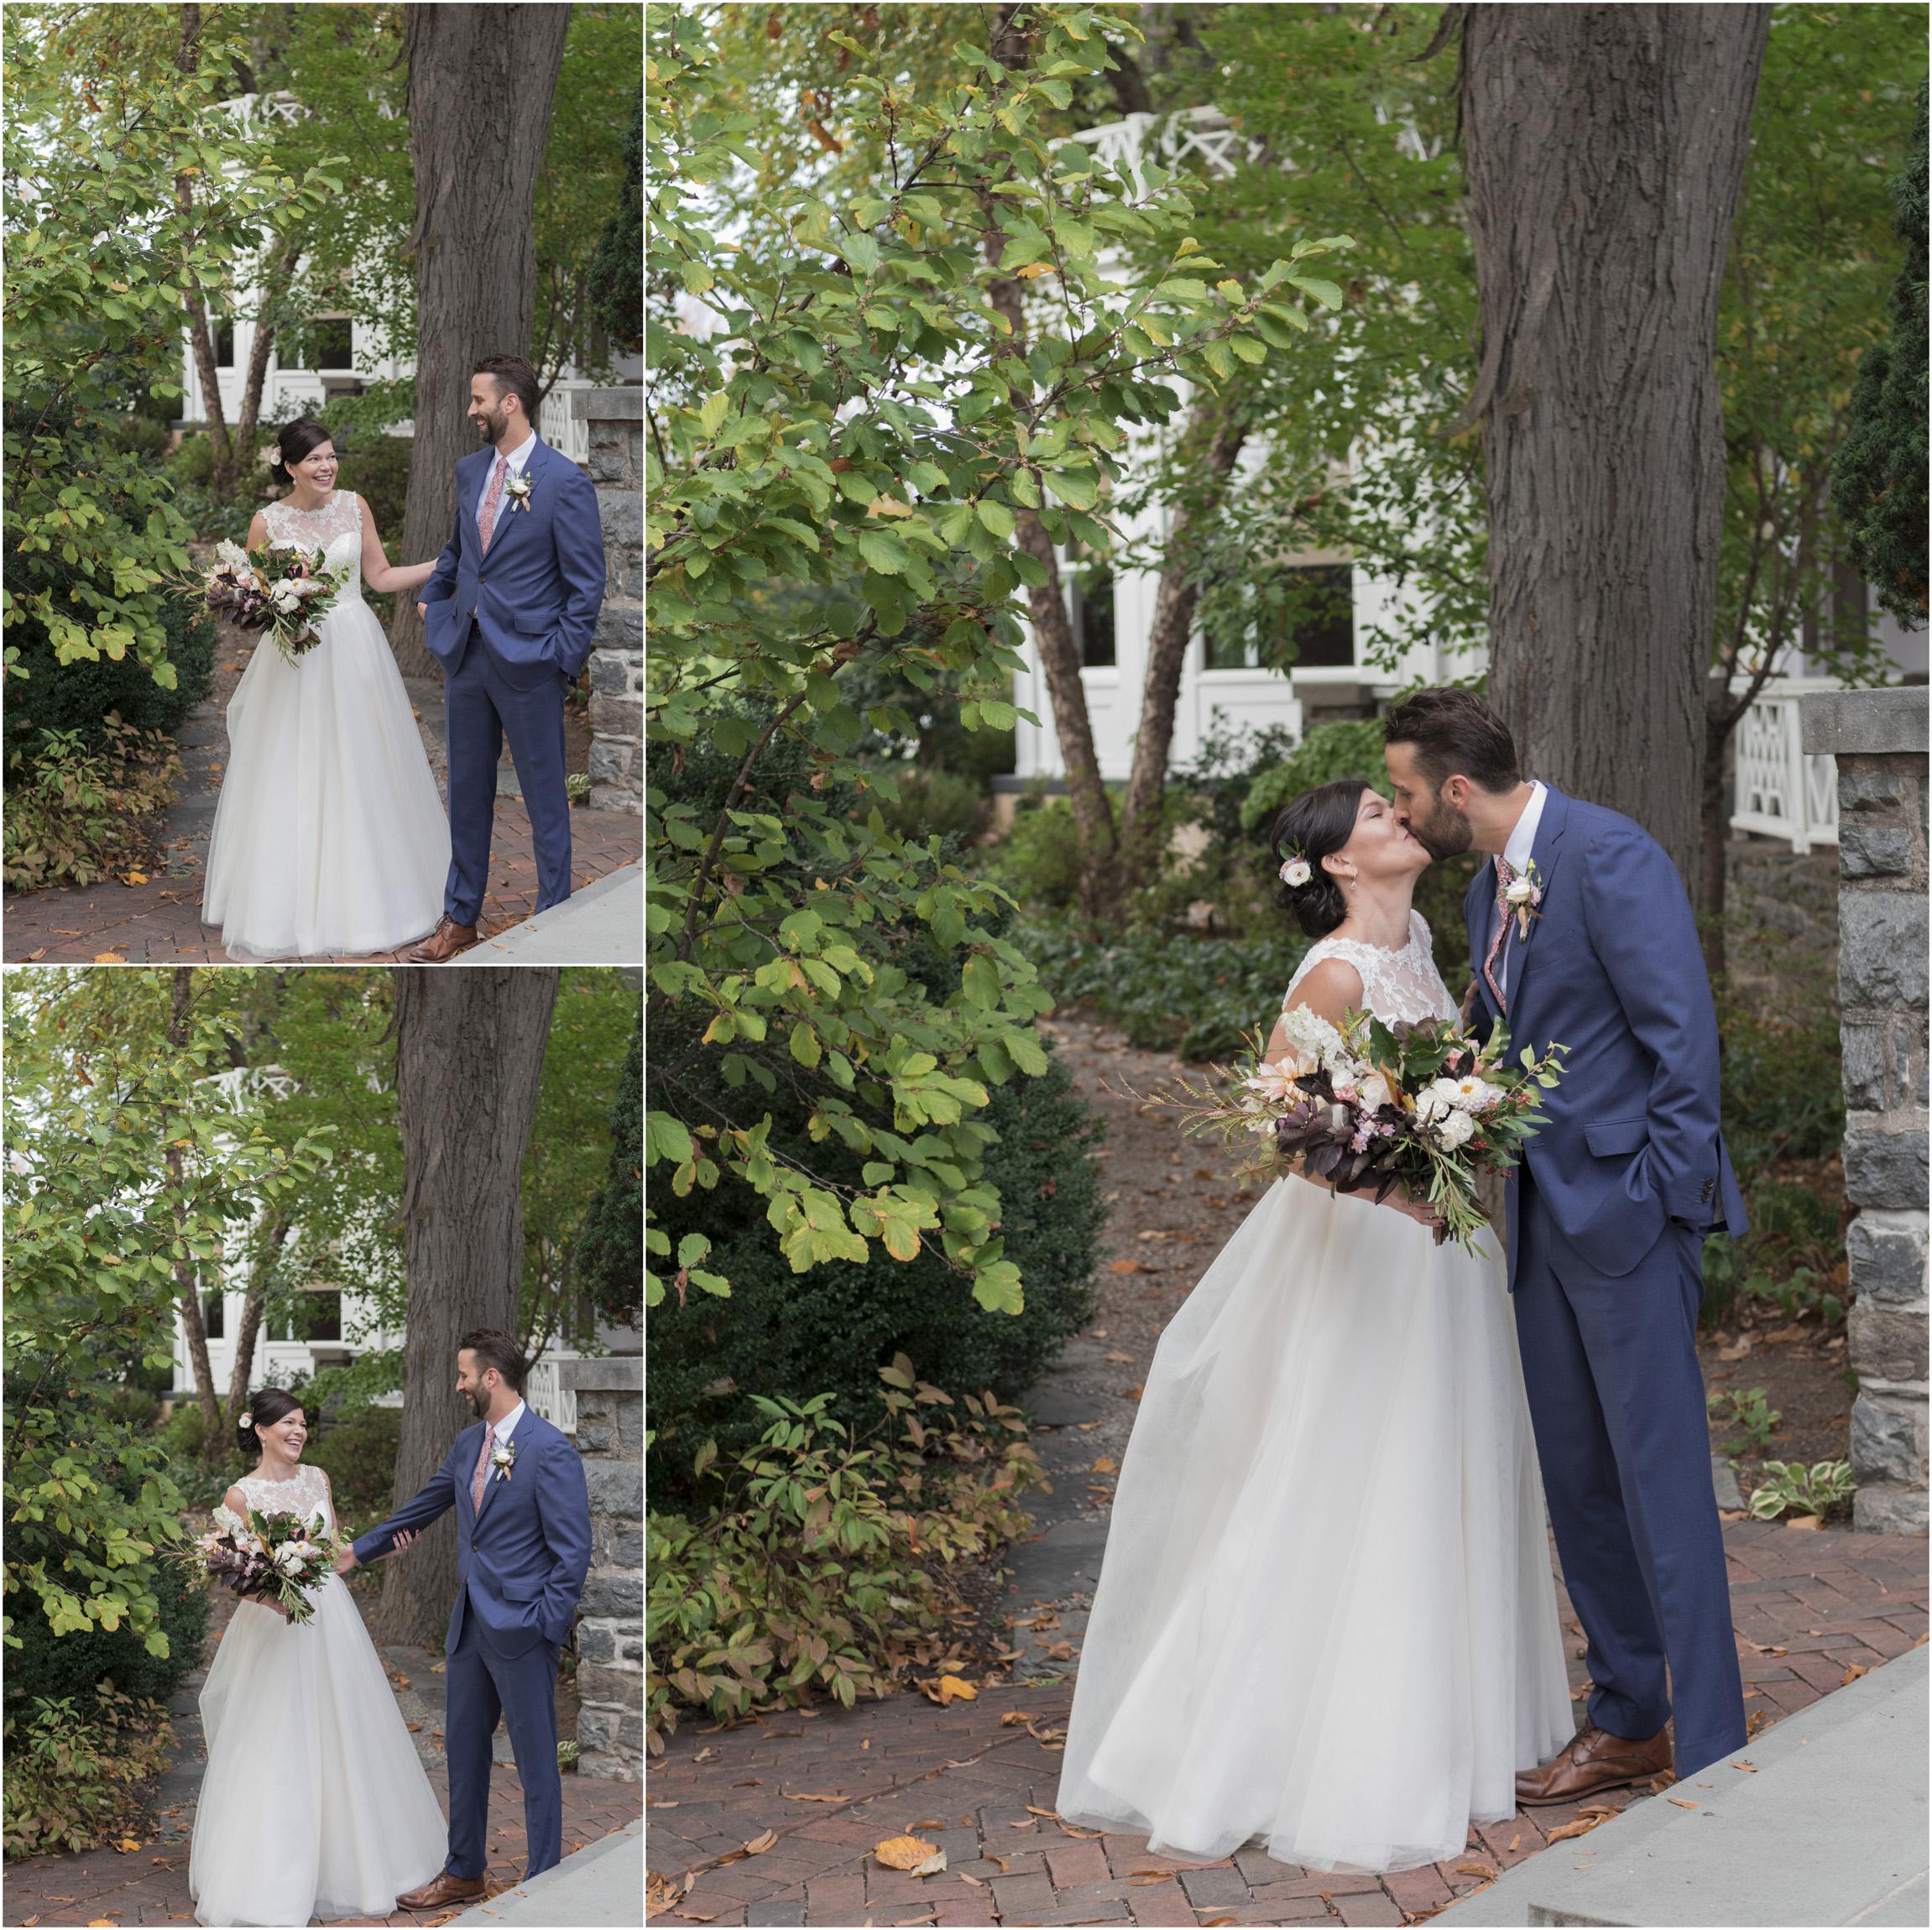 ©FianderFoto_Melissa_Mark_Wedding_Maryland_016.jpg